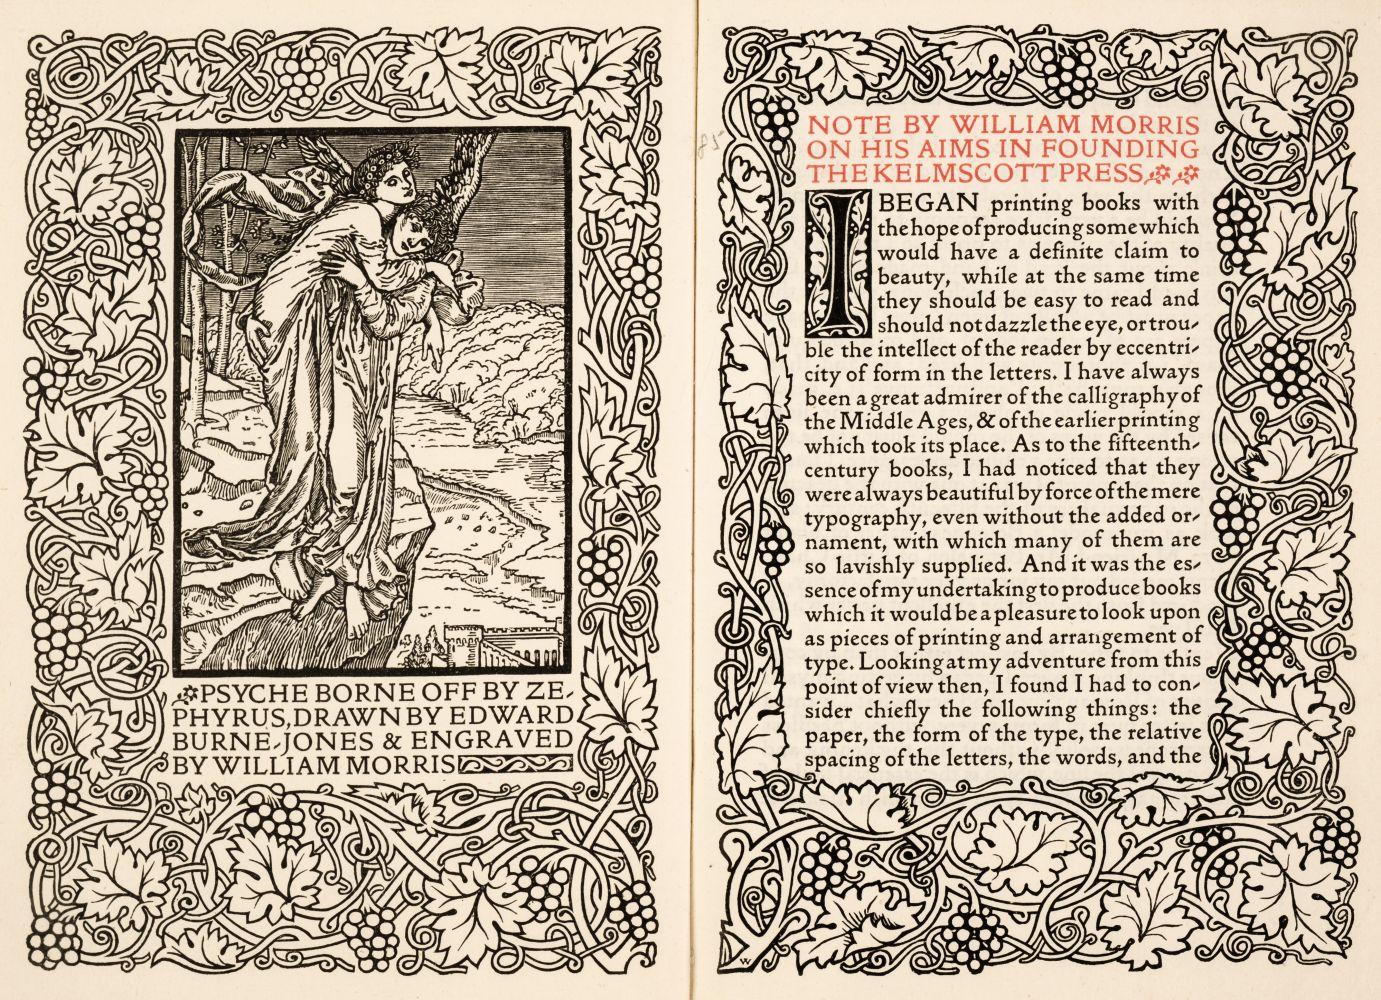 Kelmscott Press. Notes by William Morris, 1898